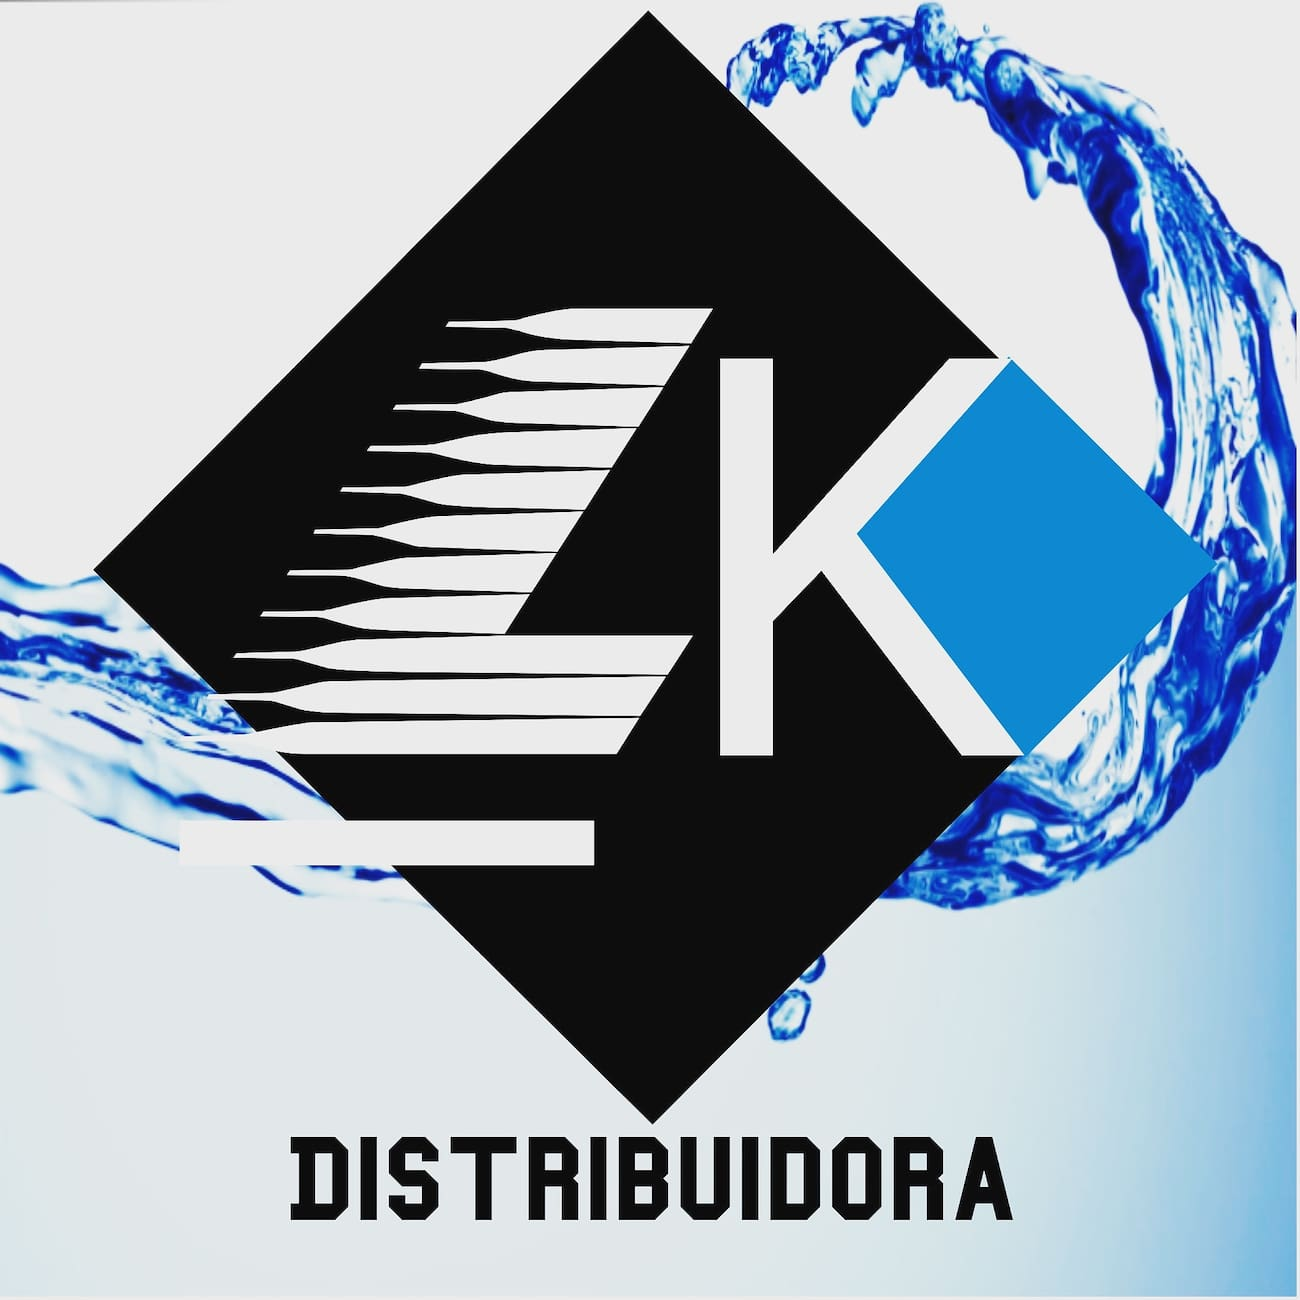 Lk Distribuidora